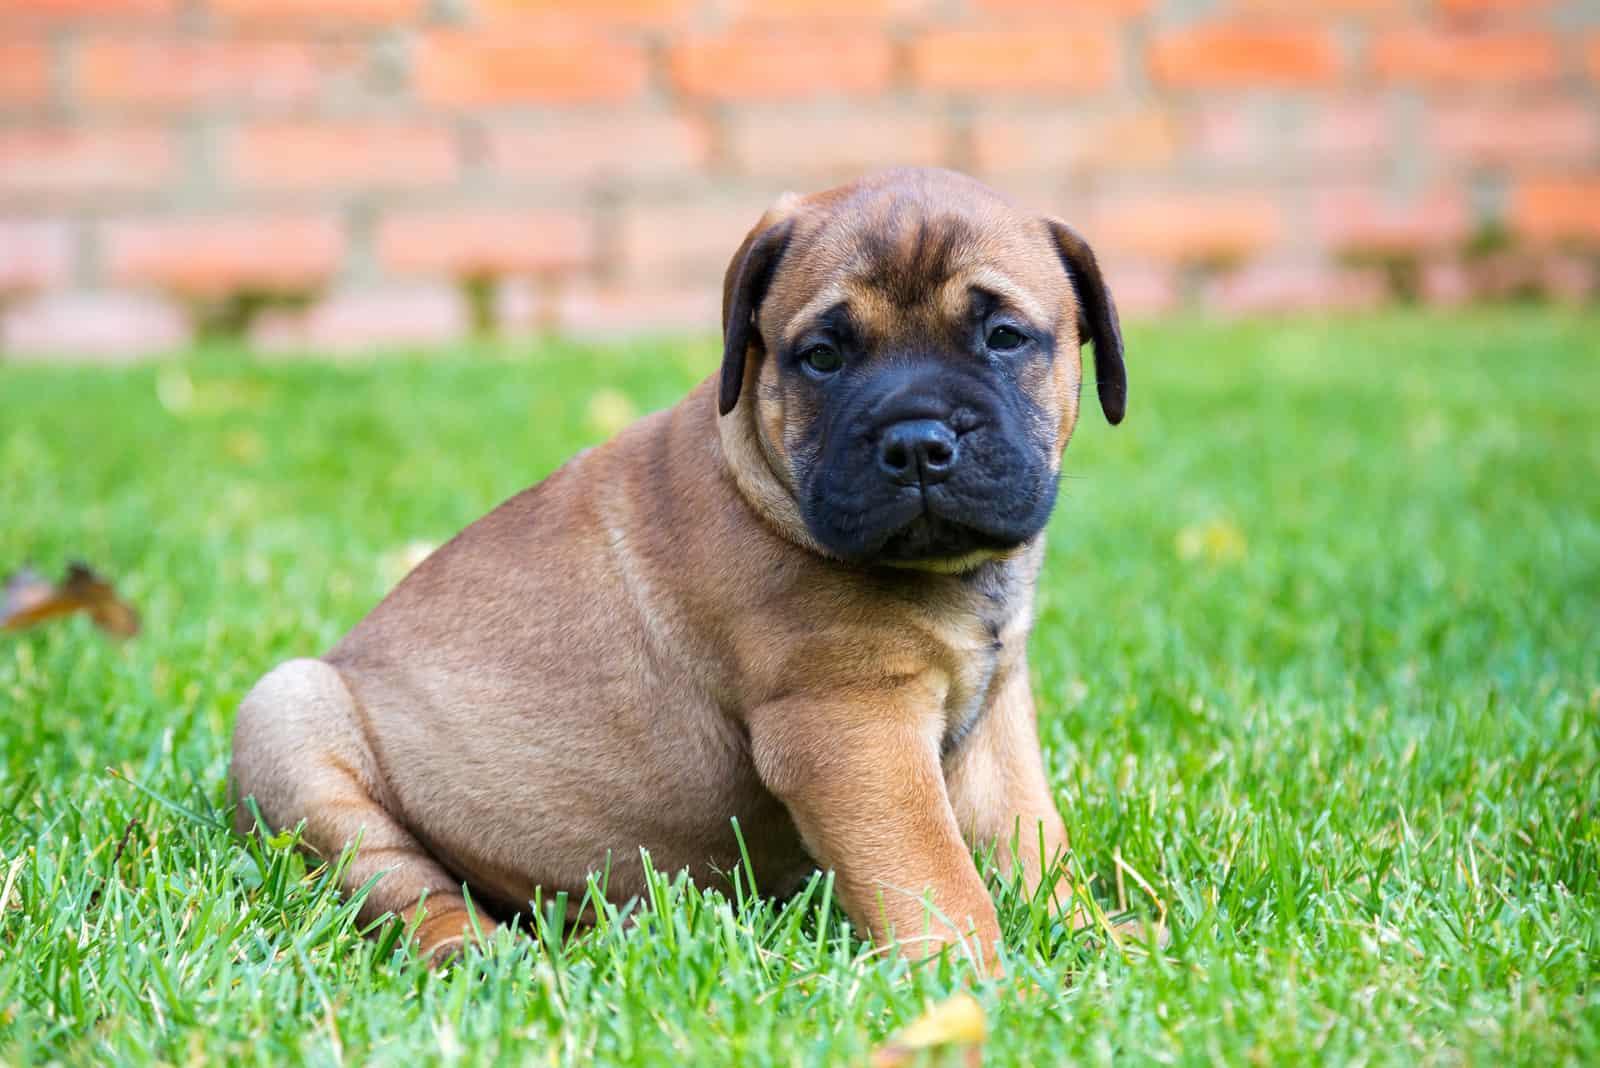 Bullmastiff puppy sitting on a green grass